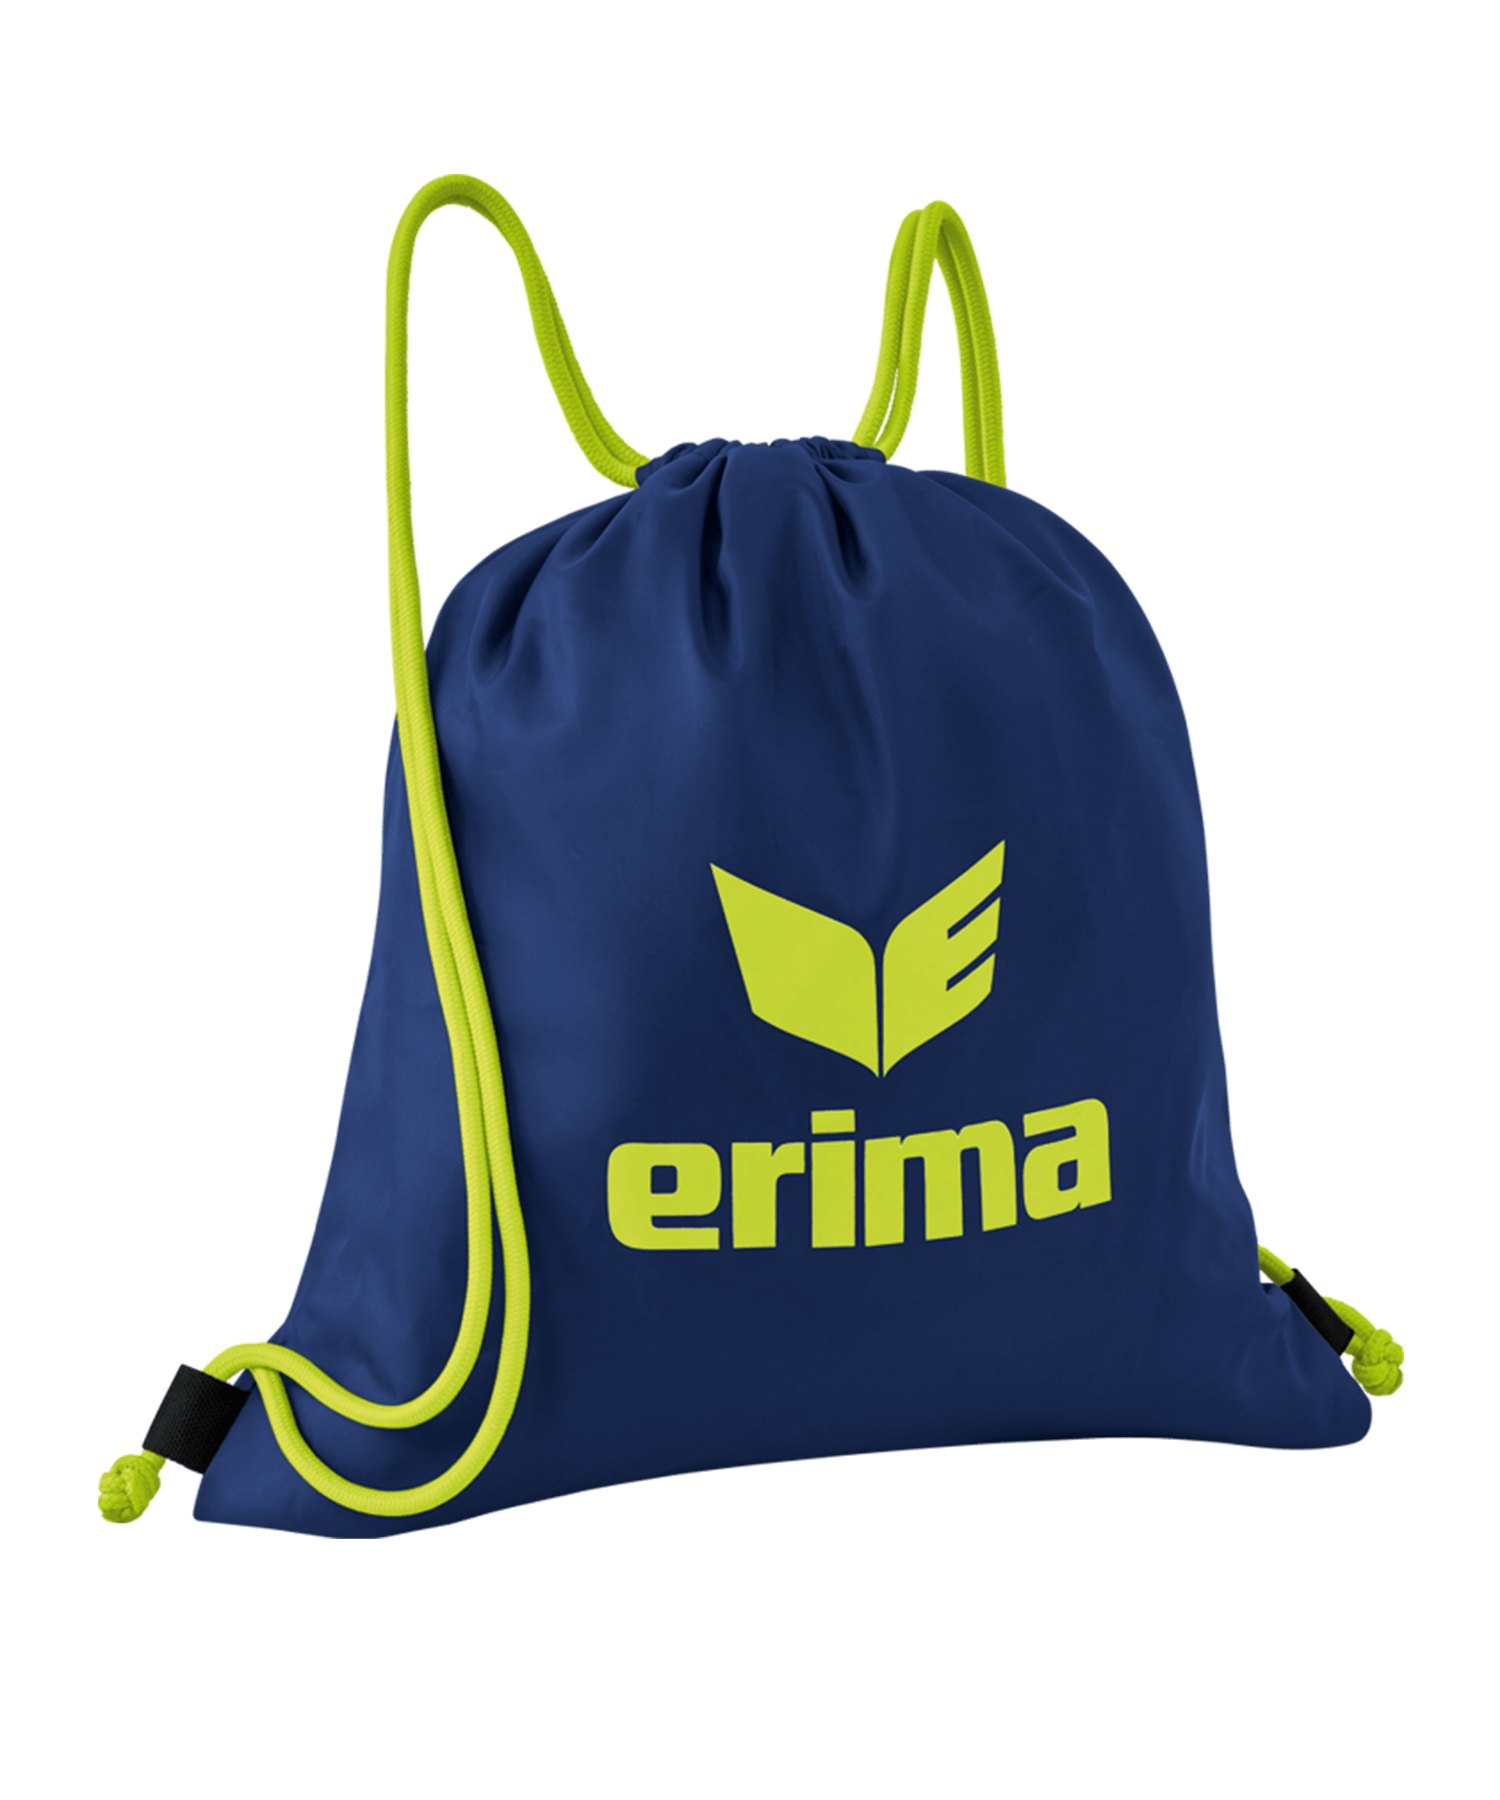 Erima Turnbeutel Pro Dunkelblau - blau